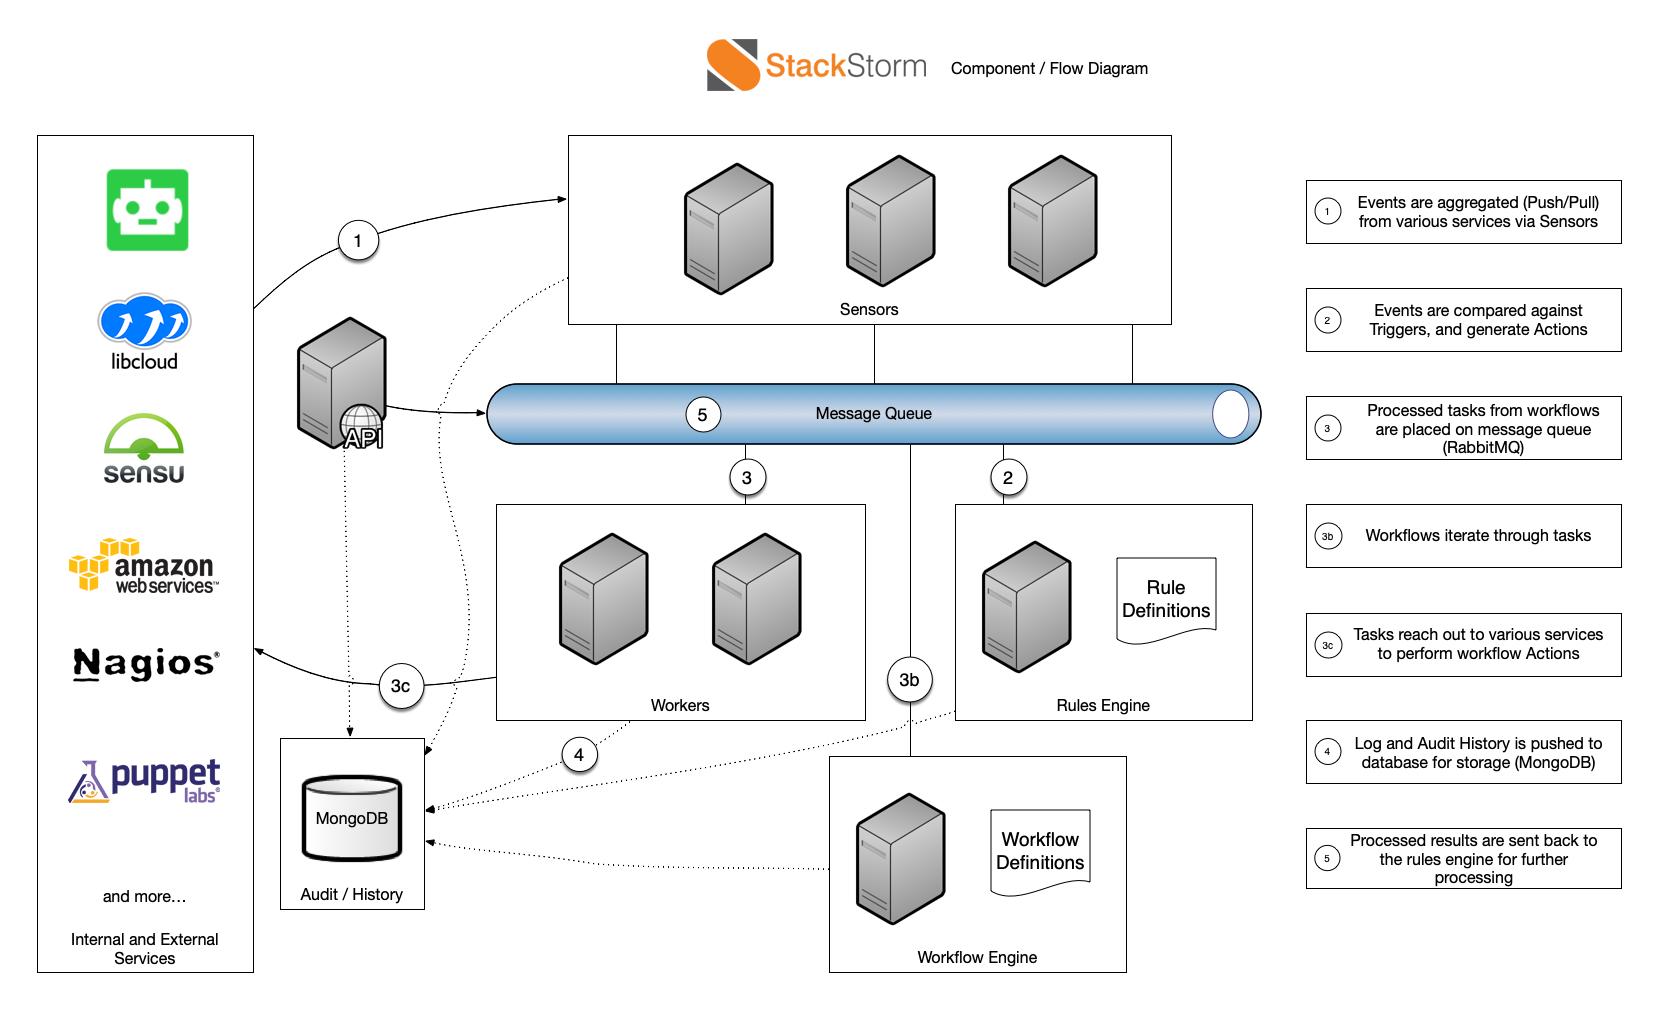 StackStorm architecture diagram